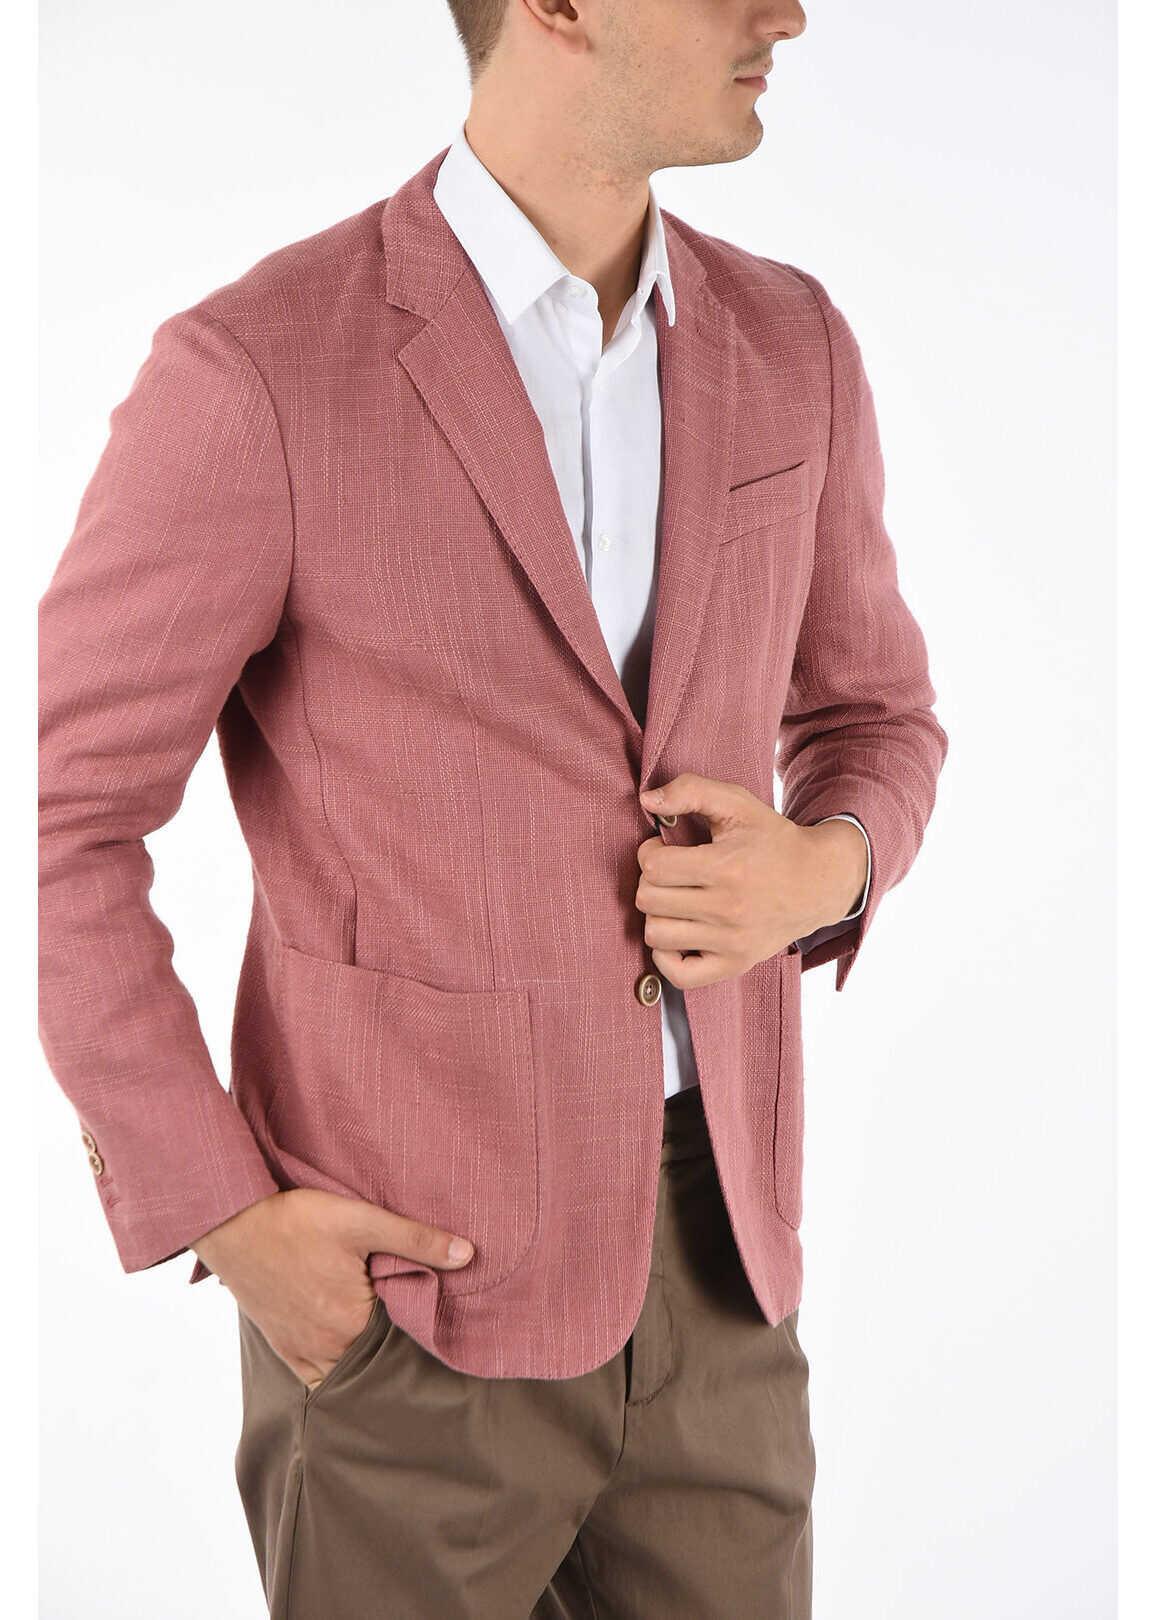 CORNELIANI ID hopsack patch pocket 2-button blazer PINK imagine